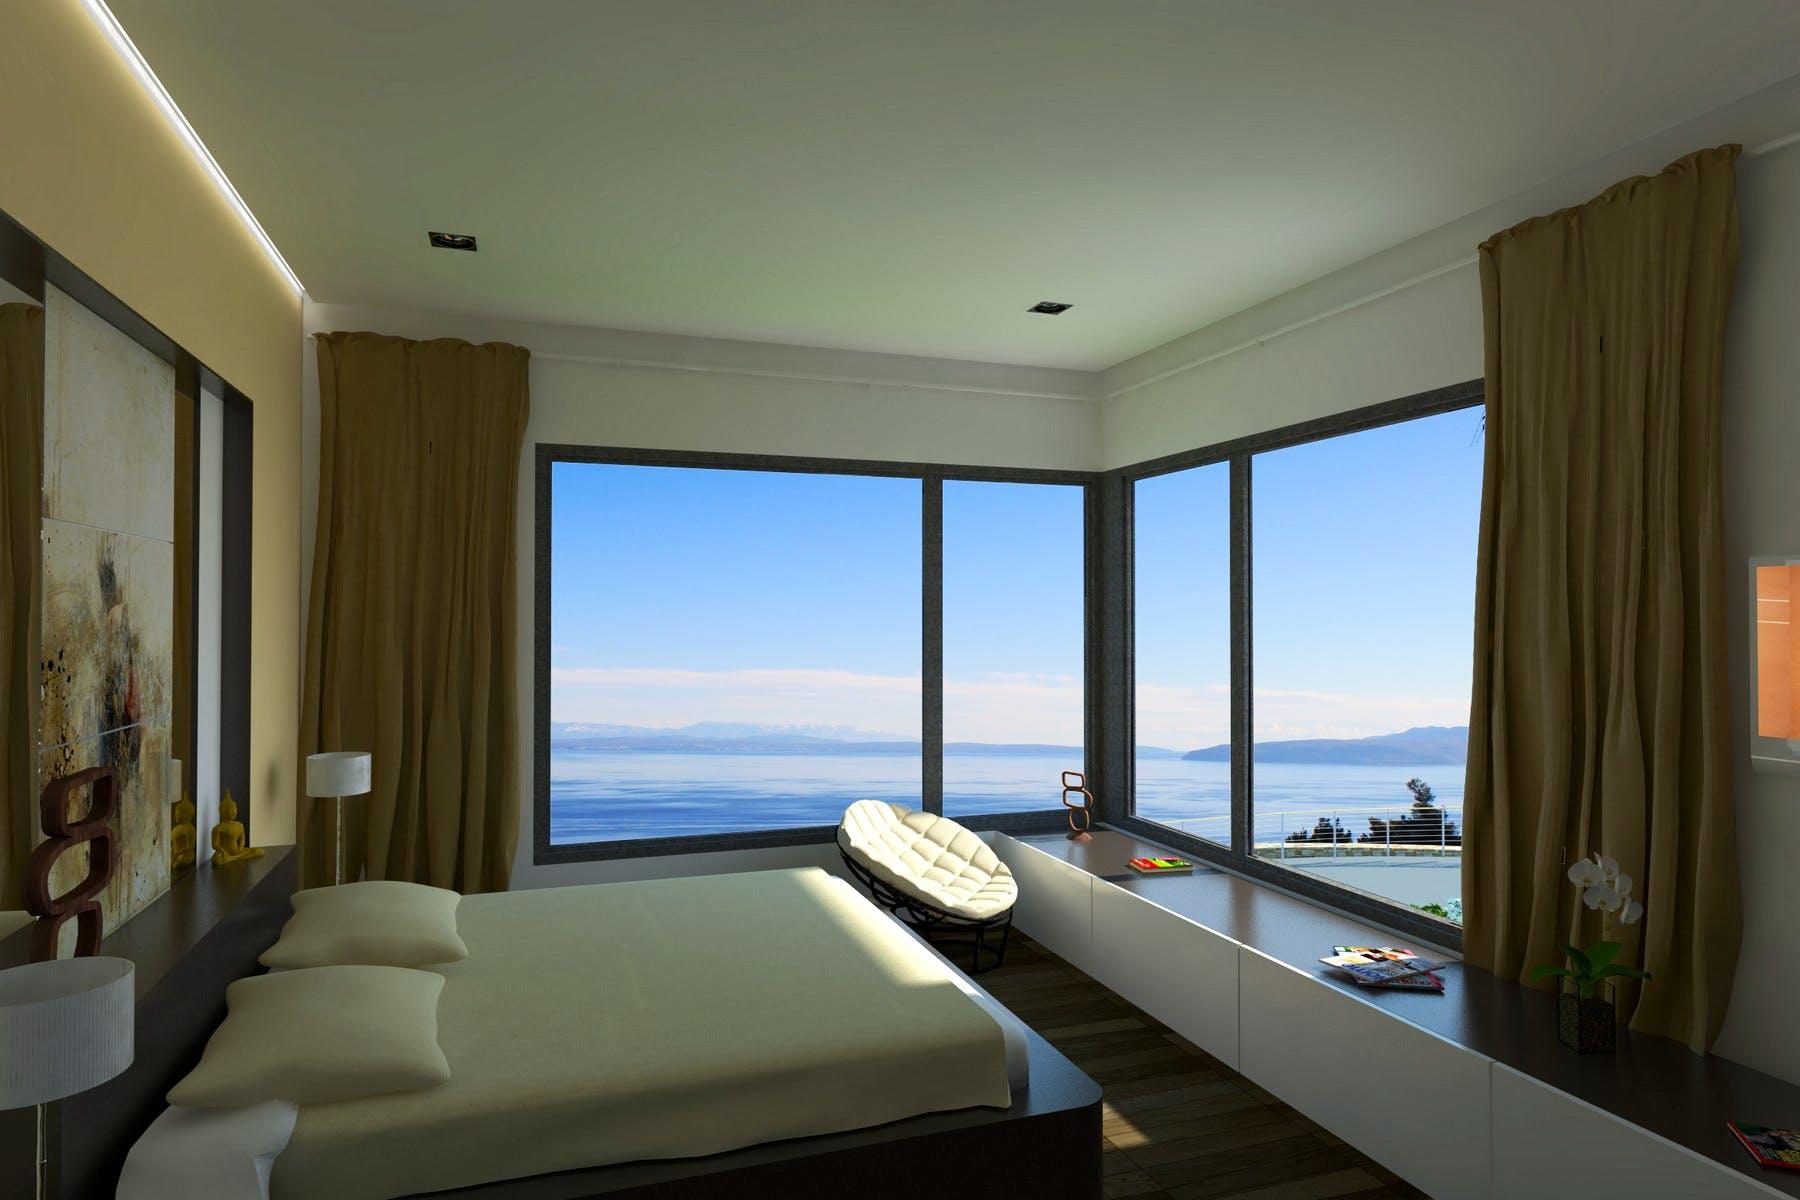 Udobna spavaća soba s pogledom na more